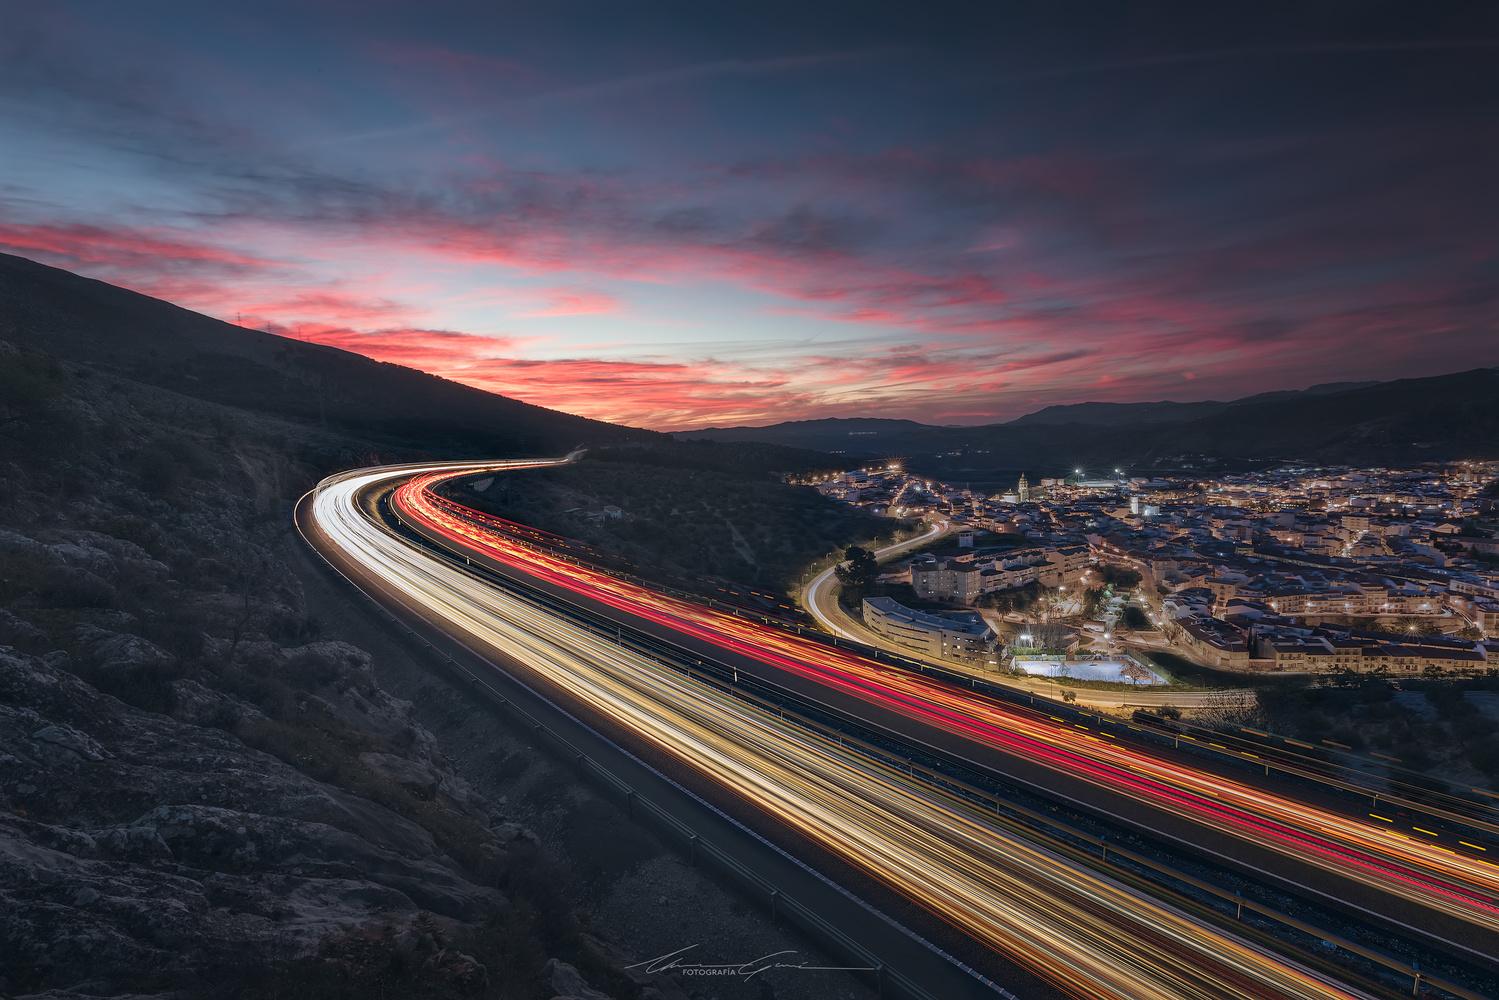 Sunset and beyond by Manu García